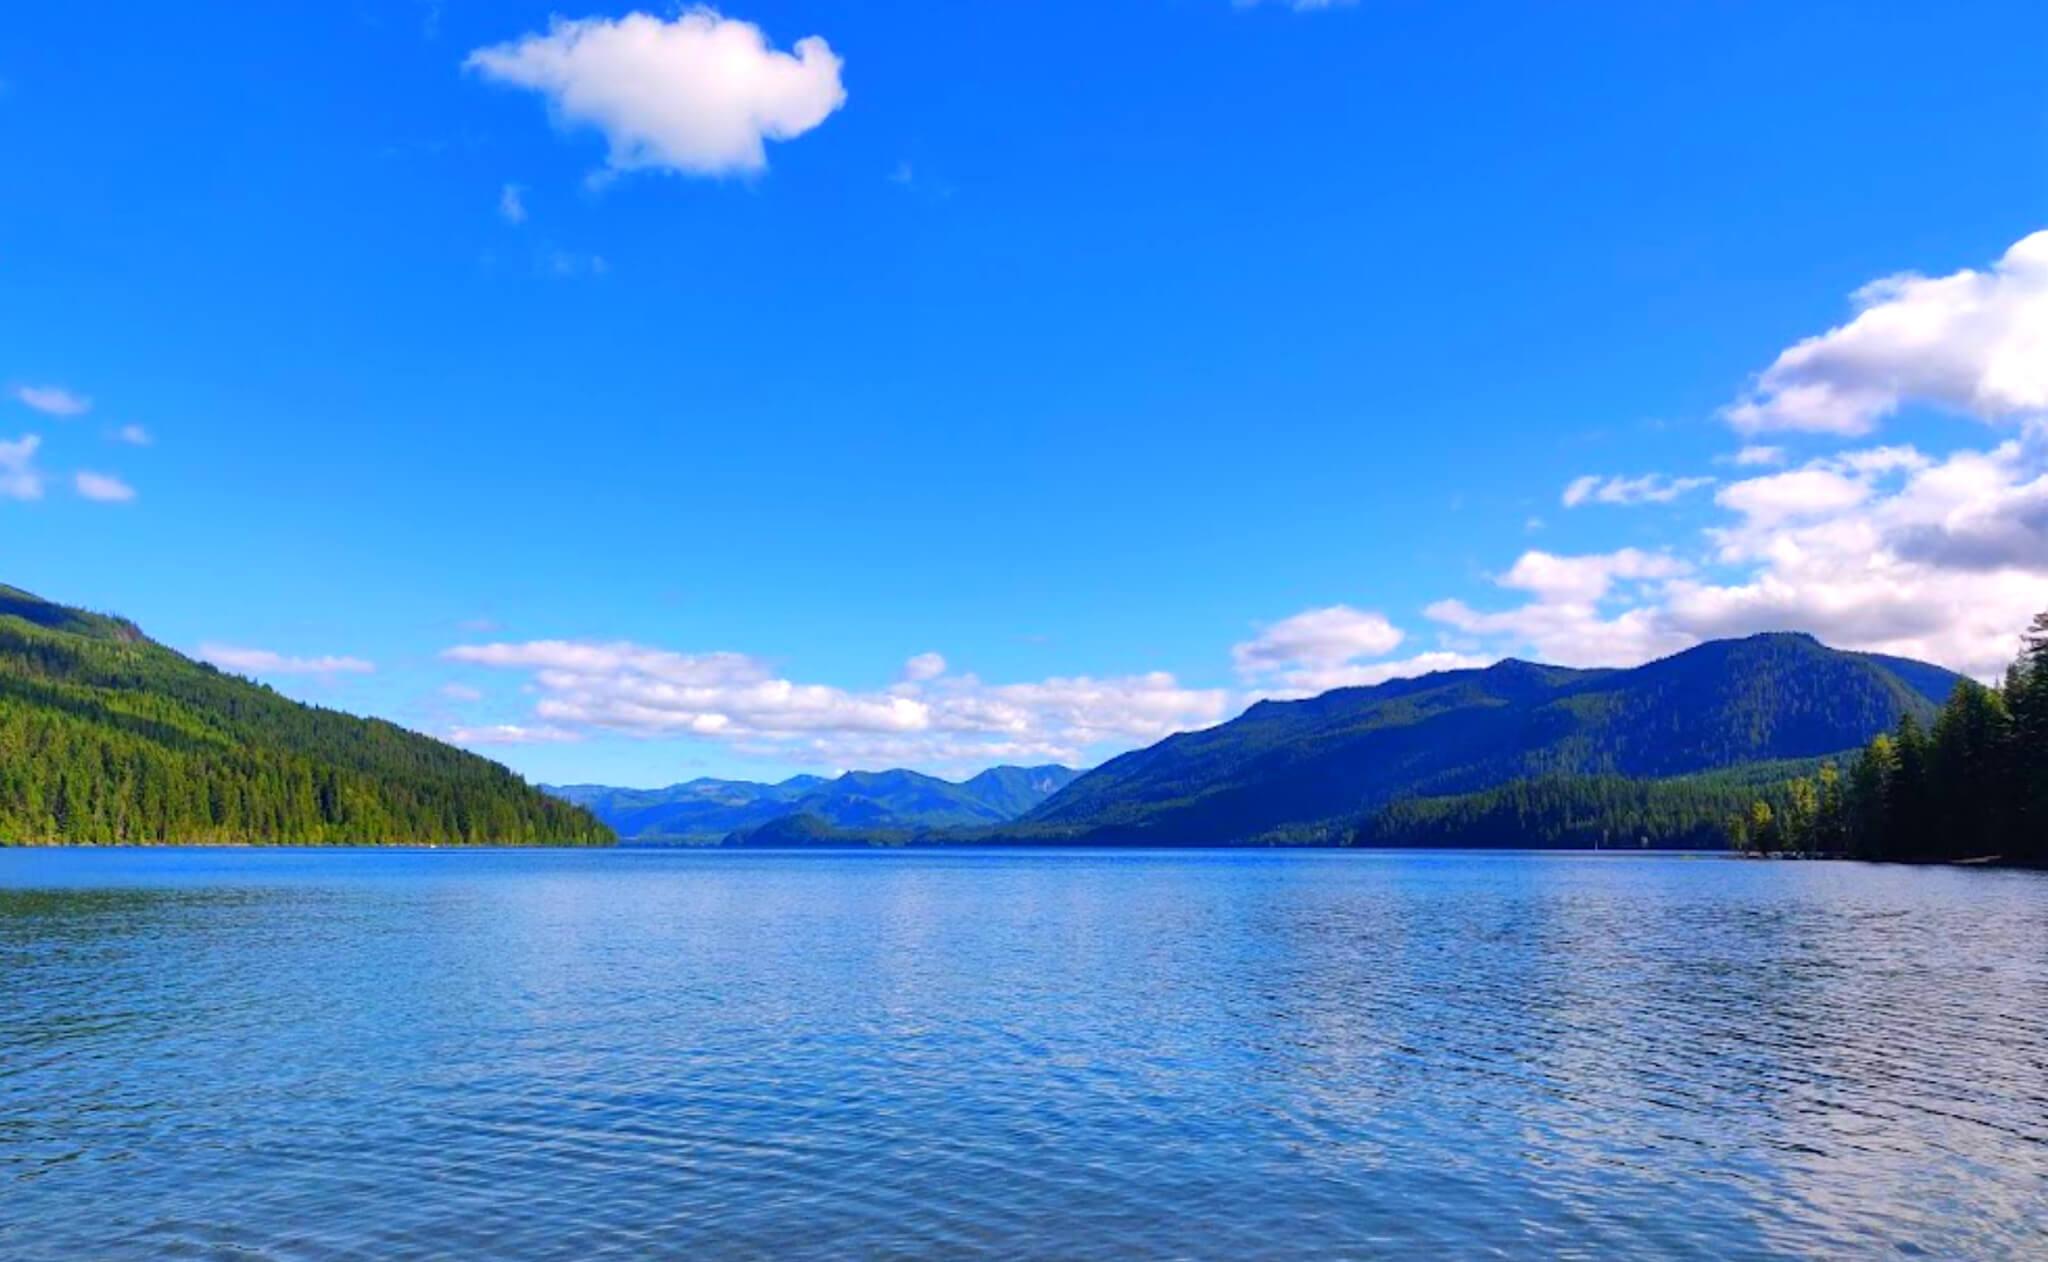 Kachess-Lake-Fishing-Report-Guide-Washington-WA-05